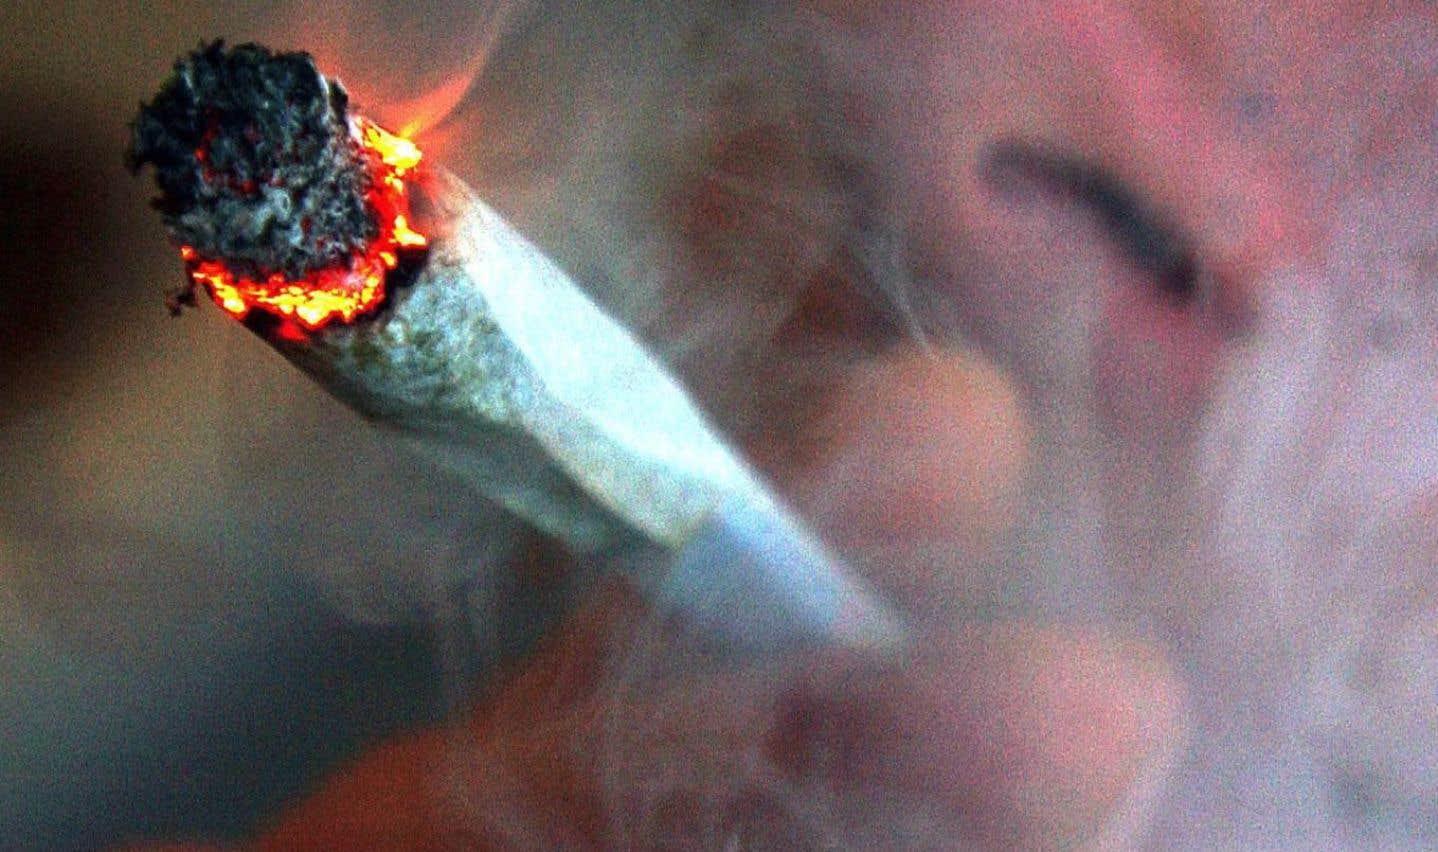 Légalisation de la marijuana: les médecins d'urgence sont inquiets